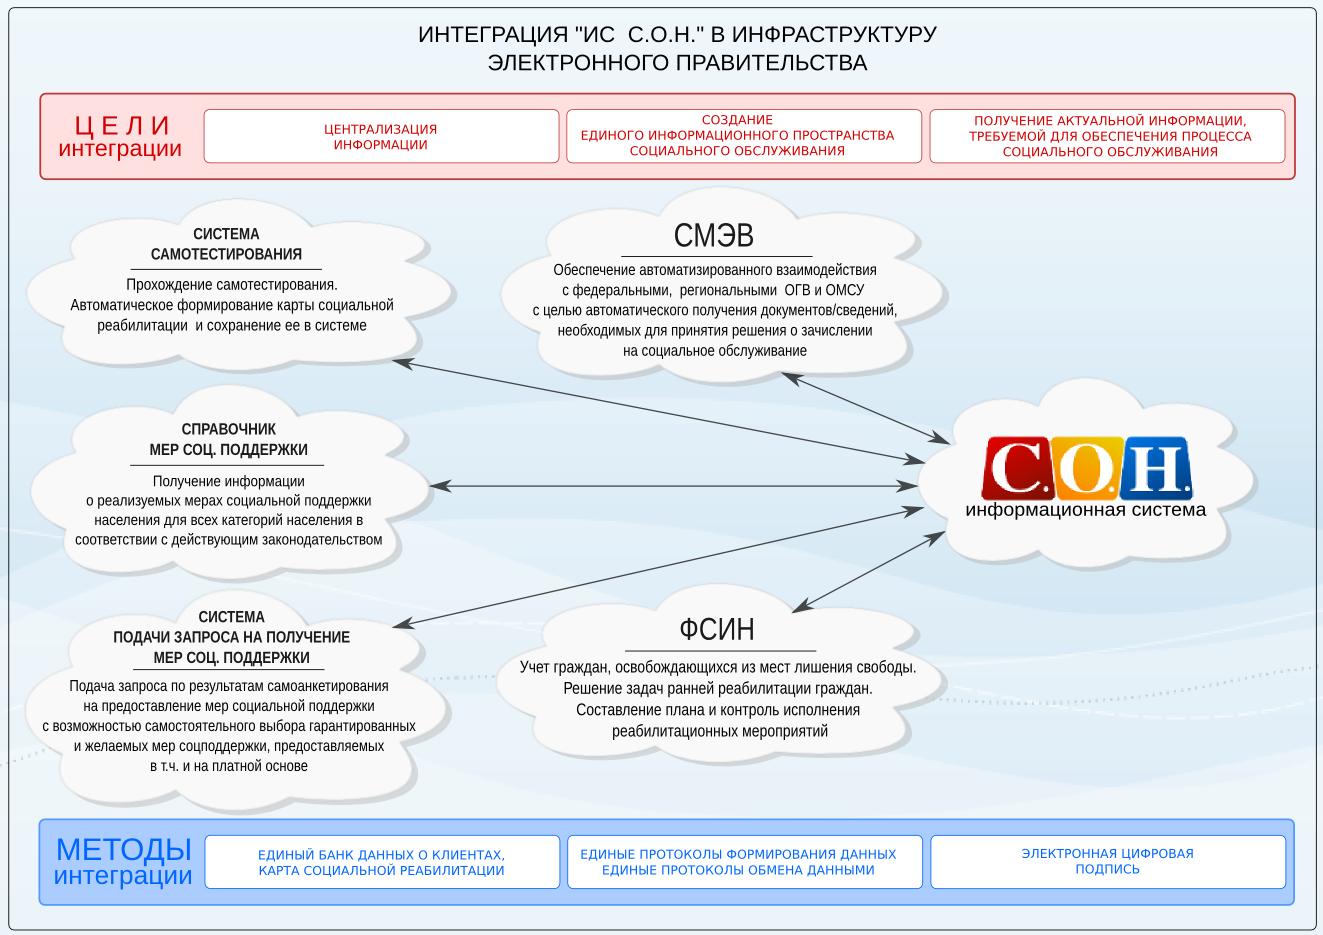 Схема интеграции ИС С.О.Н.